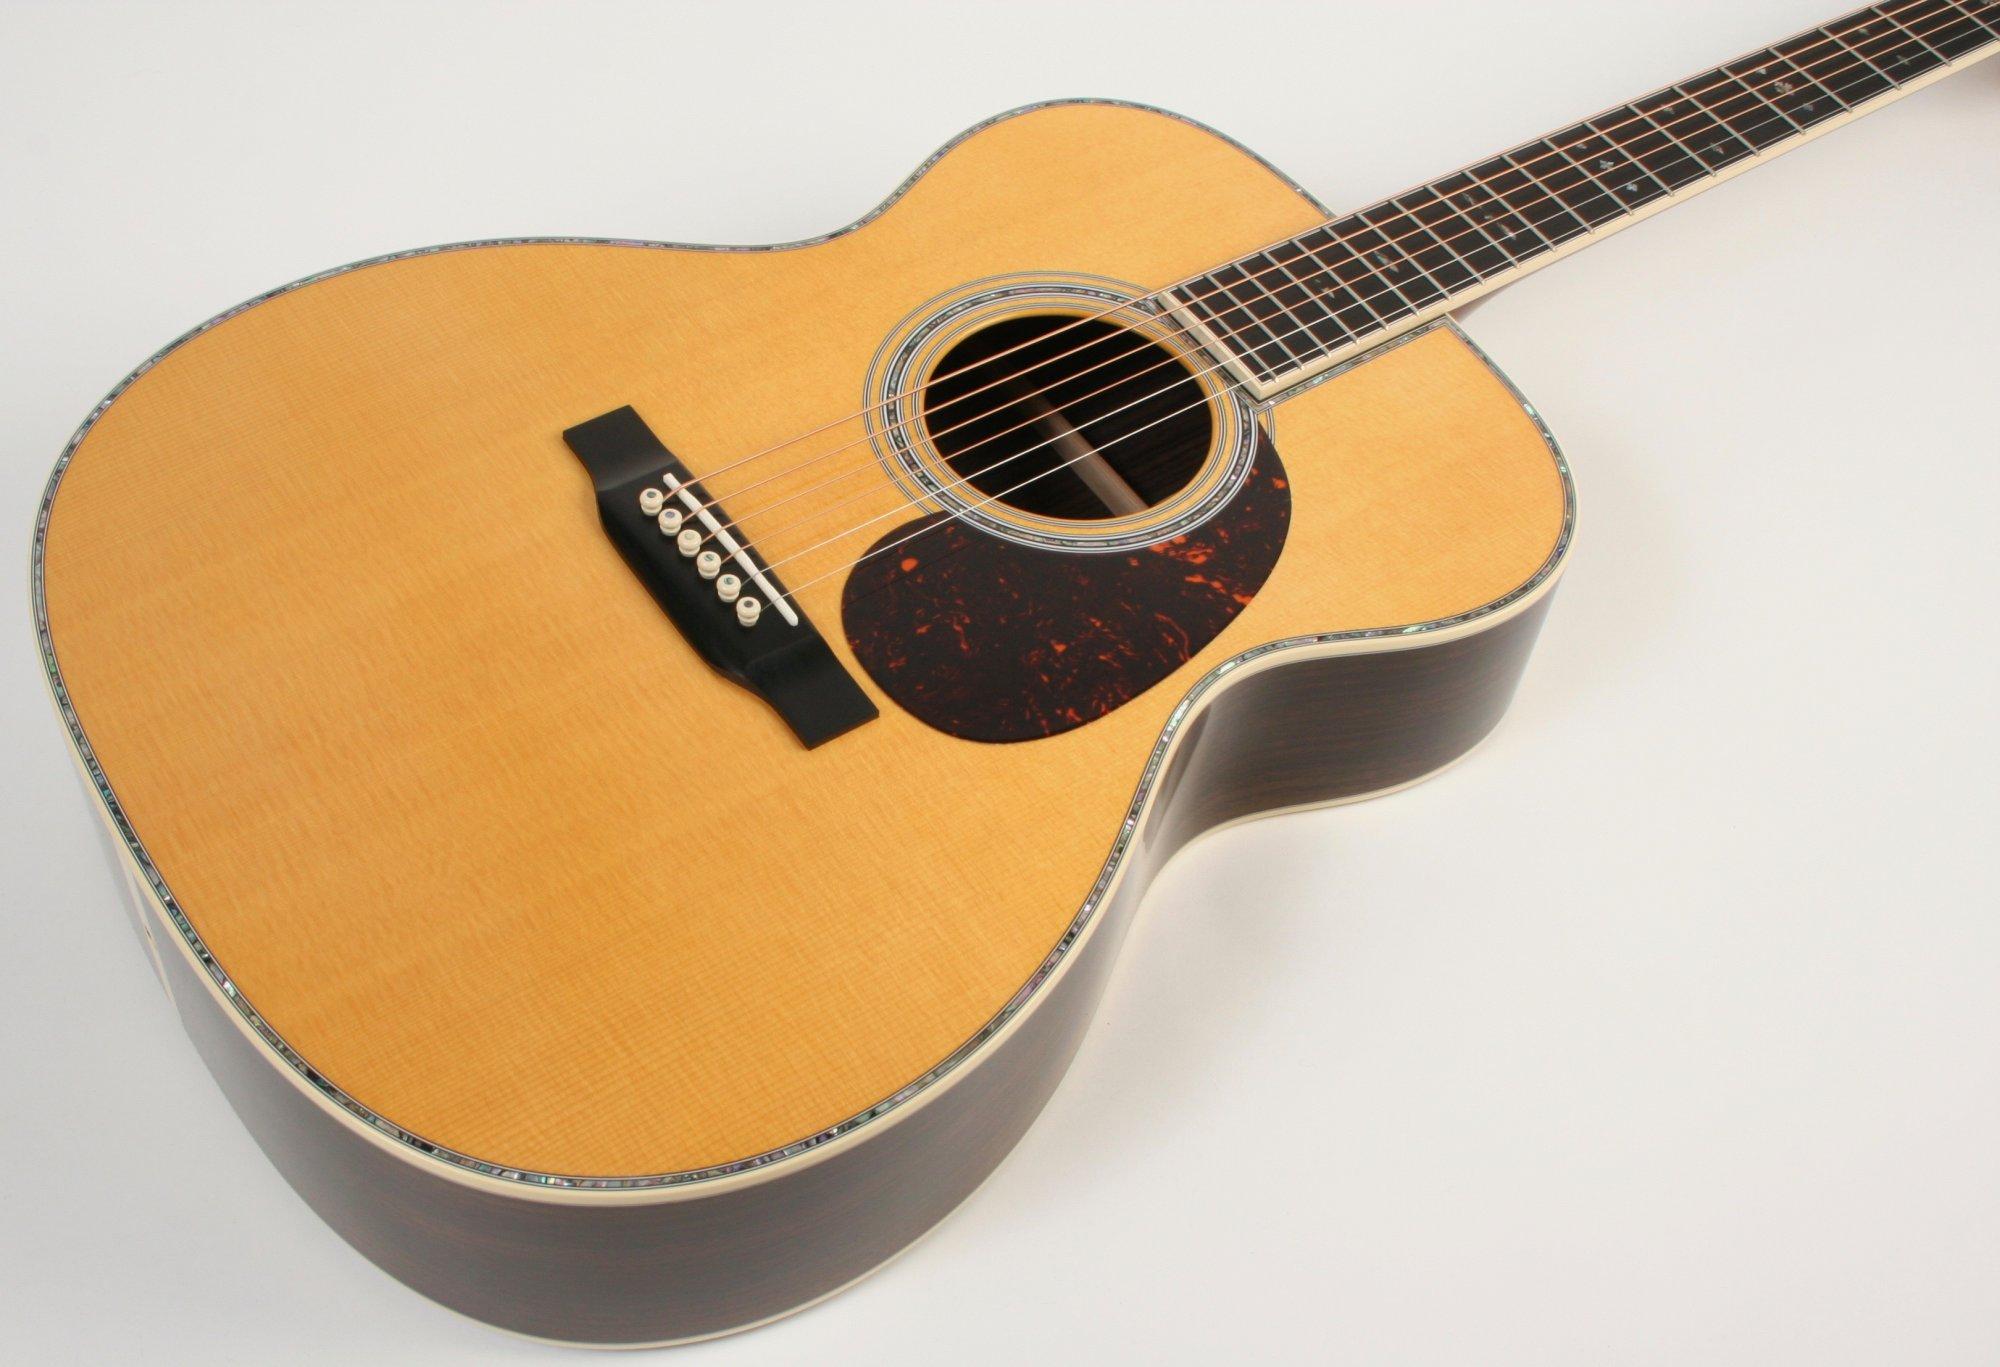 Martin 000-42 Standard Series